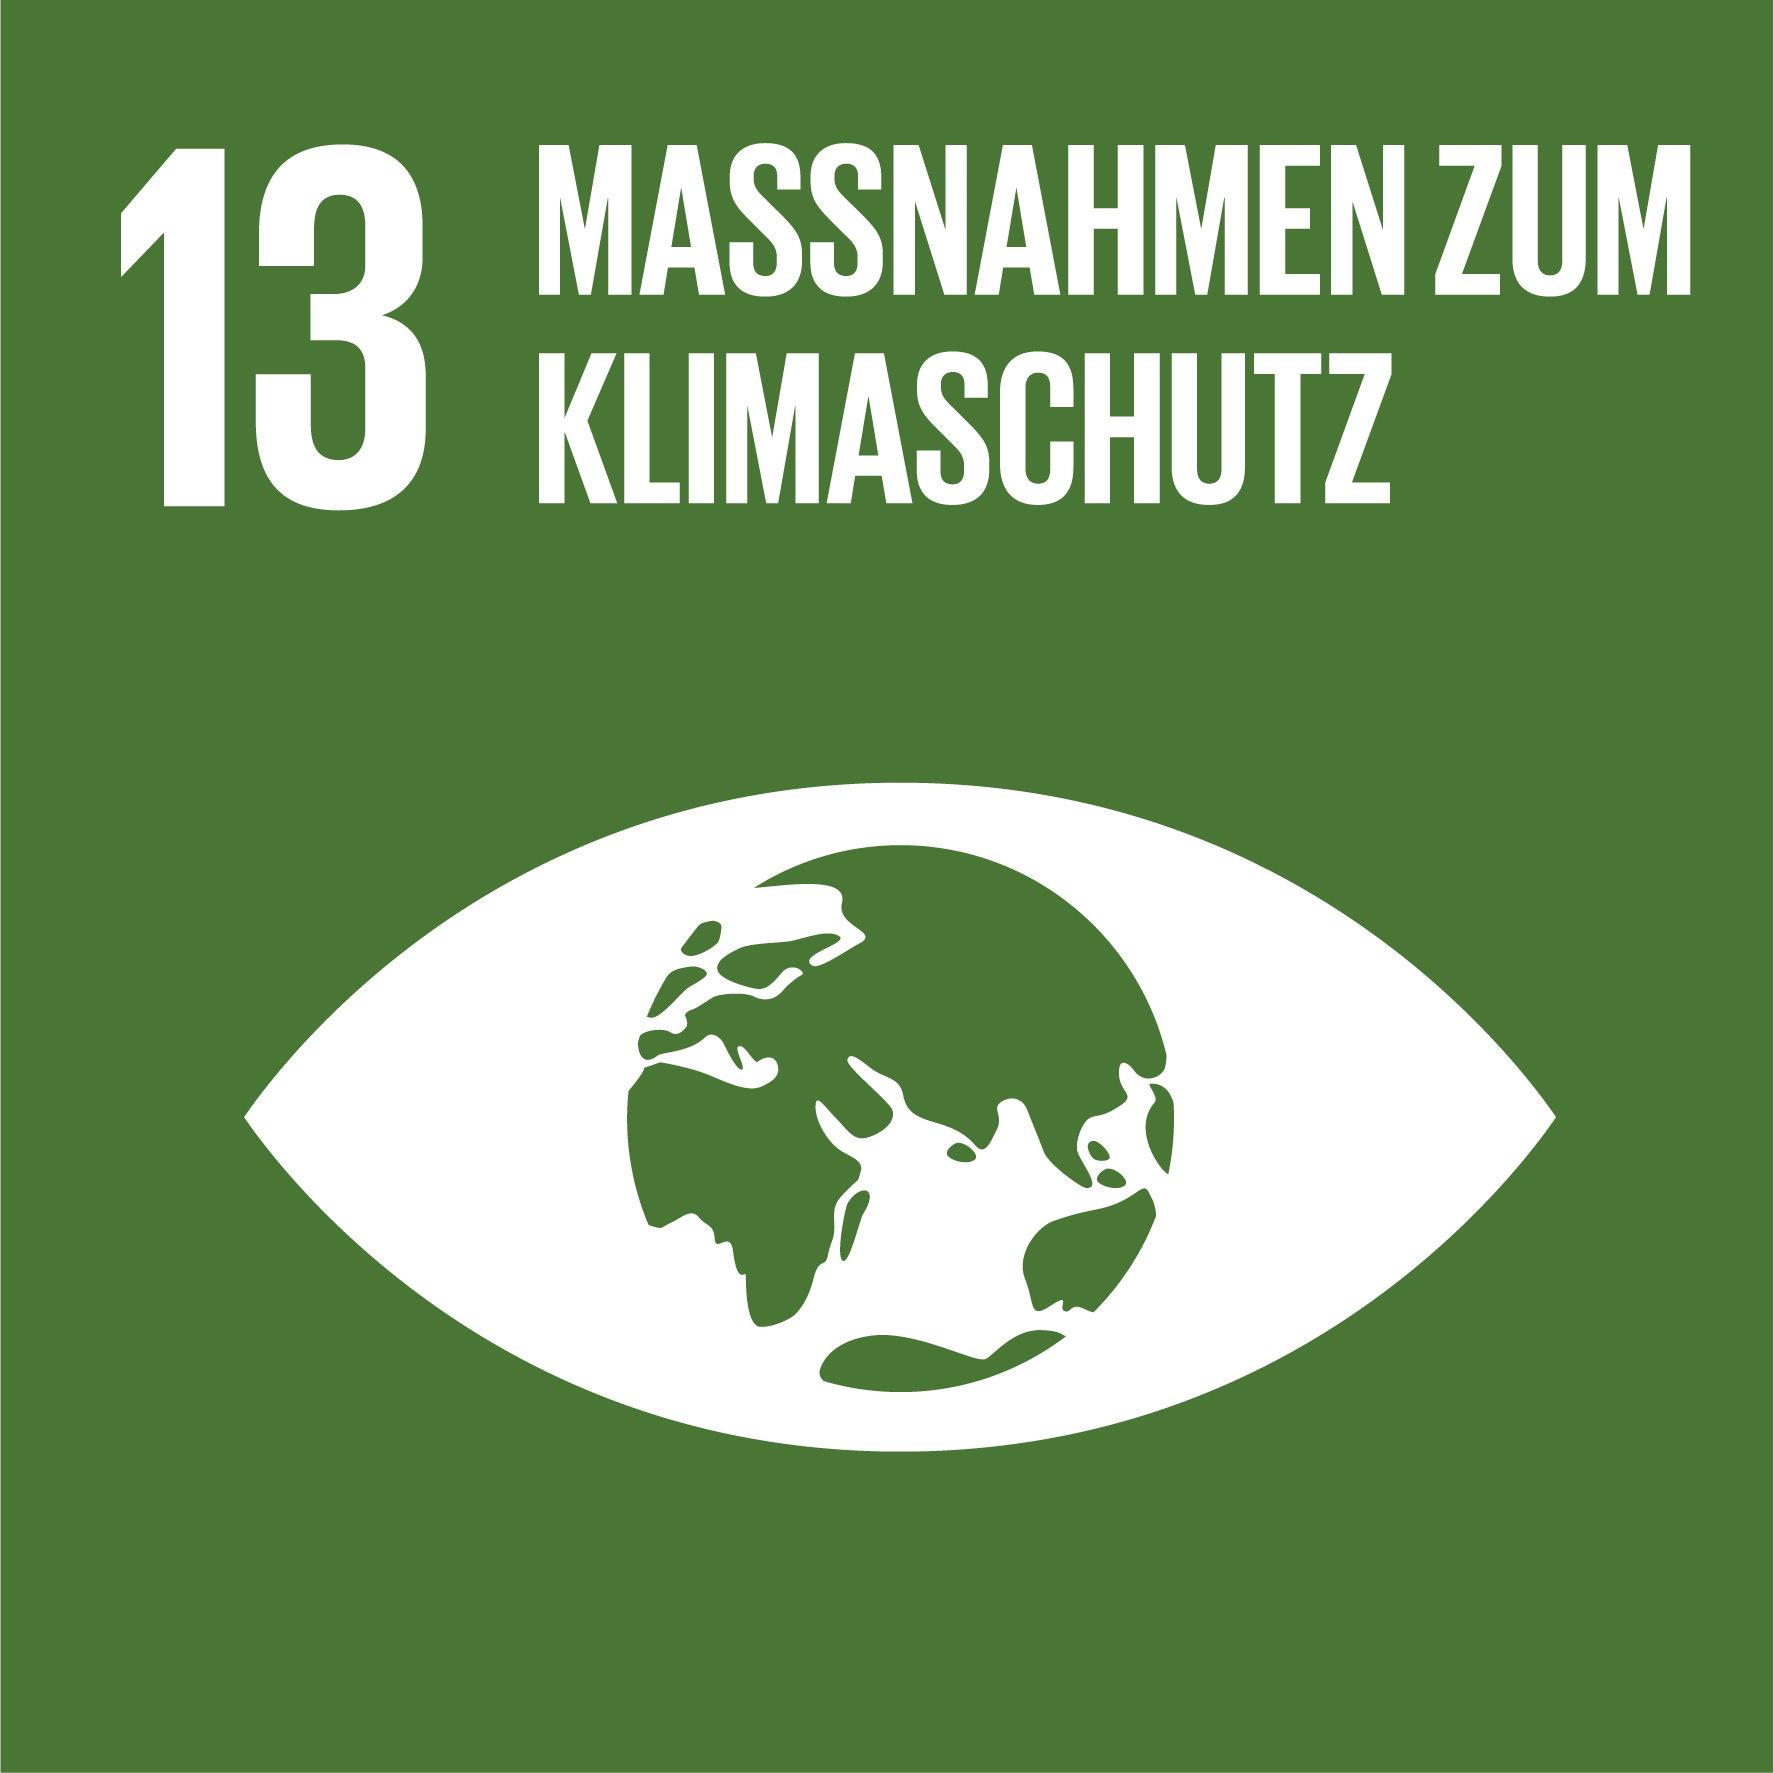 Regensburger_Nachhaltigkeitswoche_SDG_13